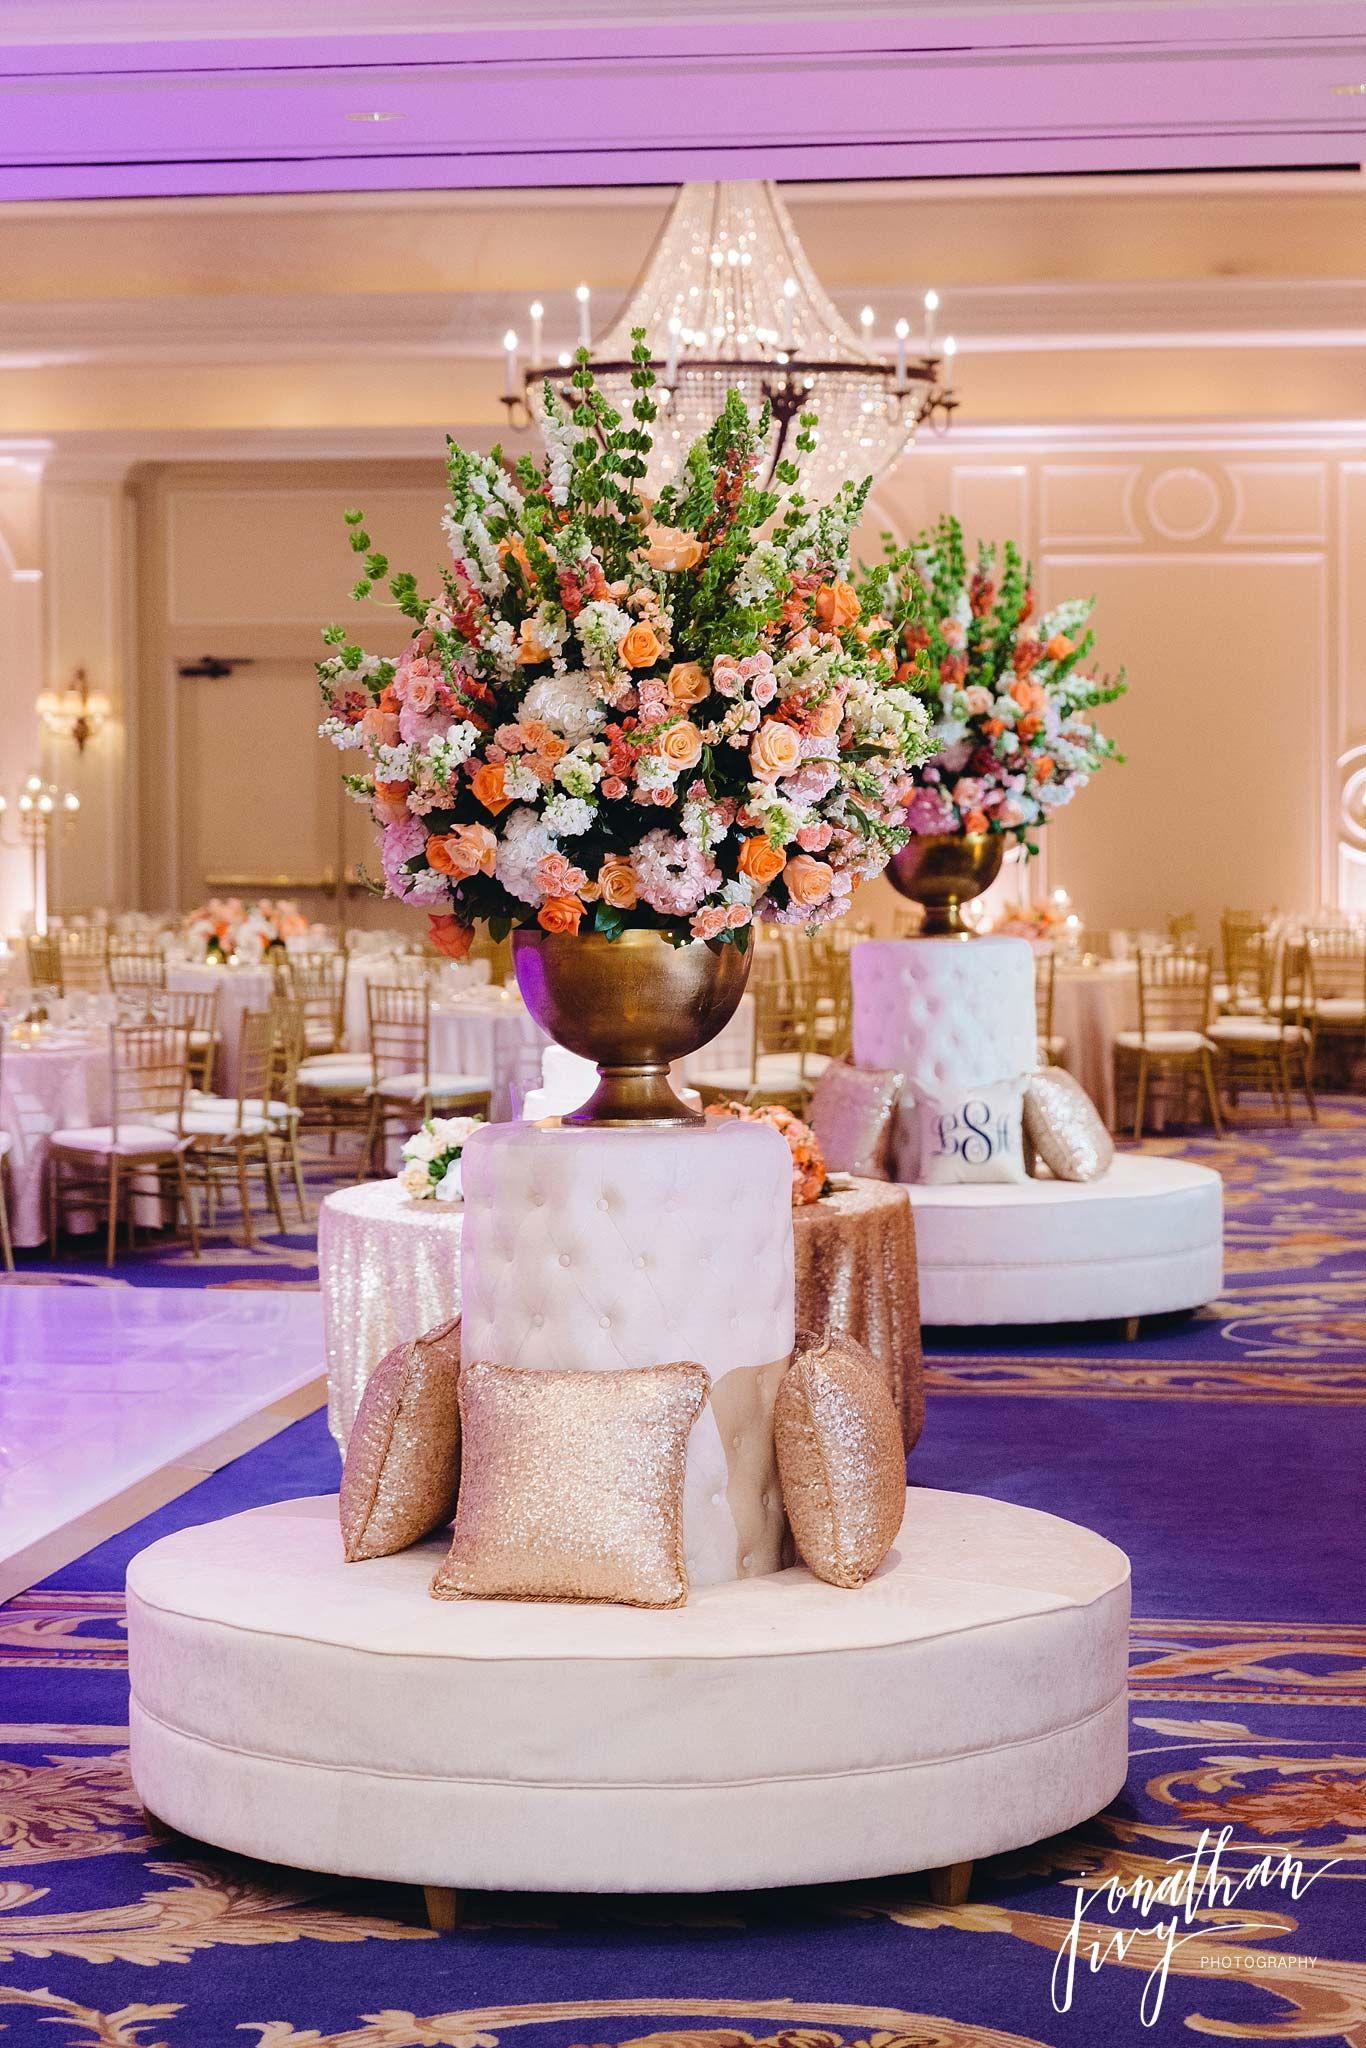 The houstonian hotel wedding in the grande ballroom wedding the houstonian hotel wedding in the grande ballroom junglespirit Image collections